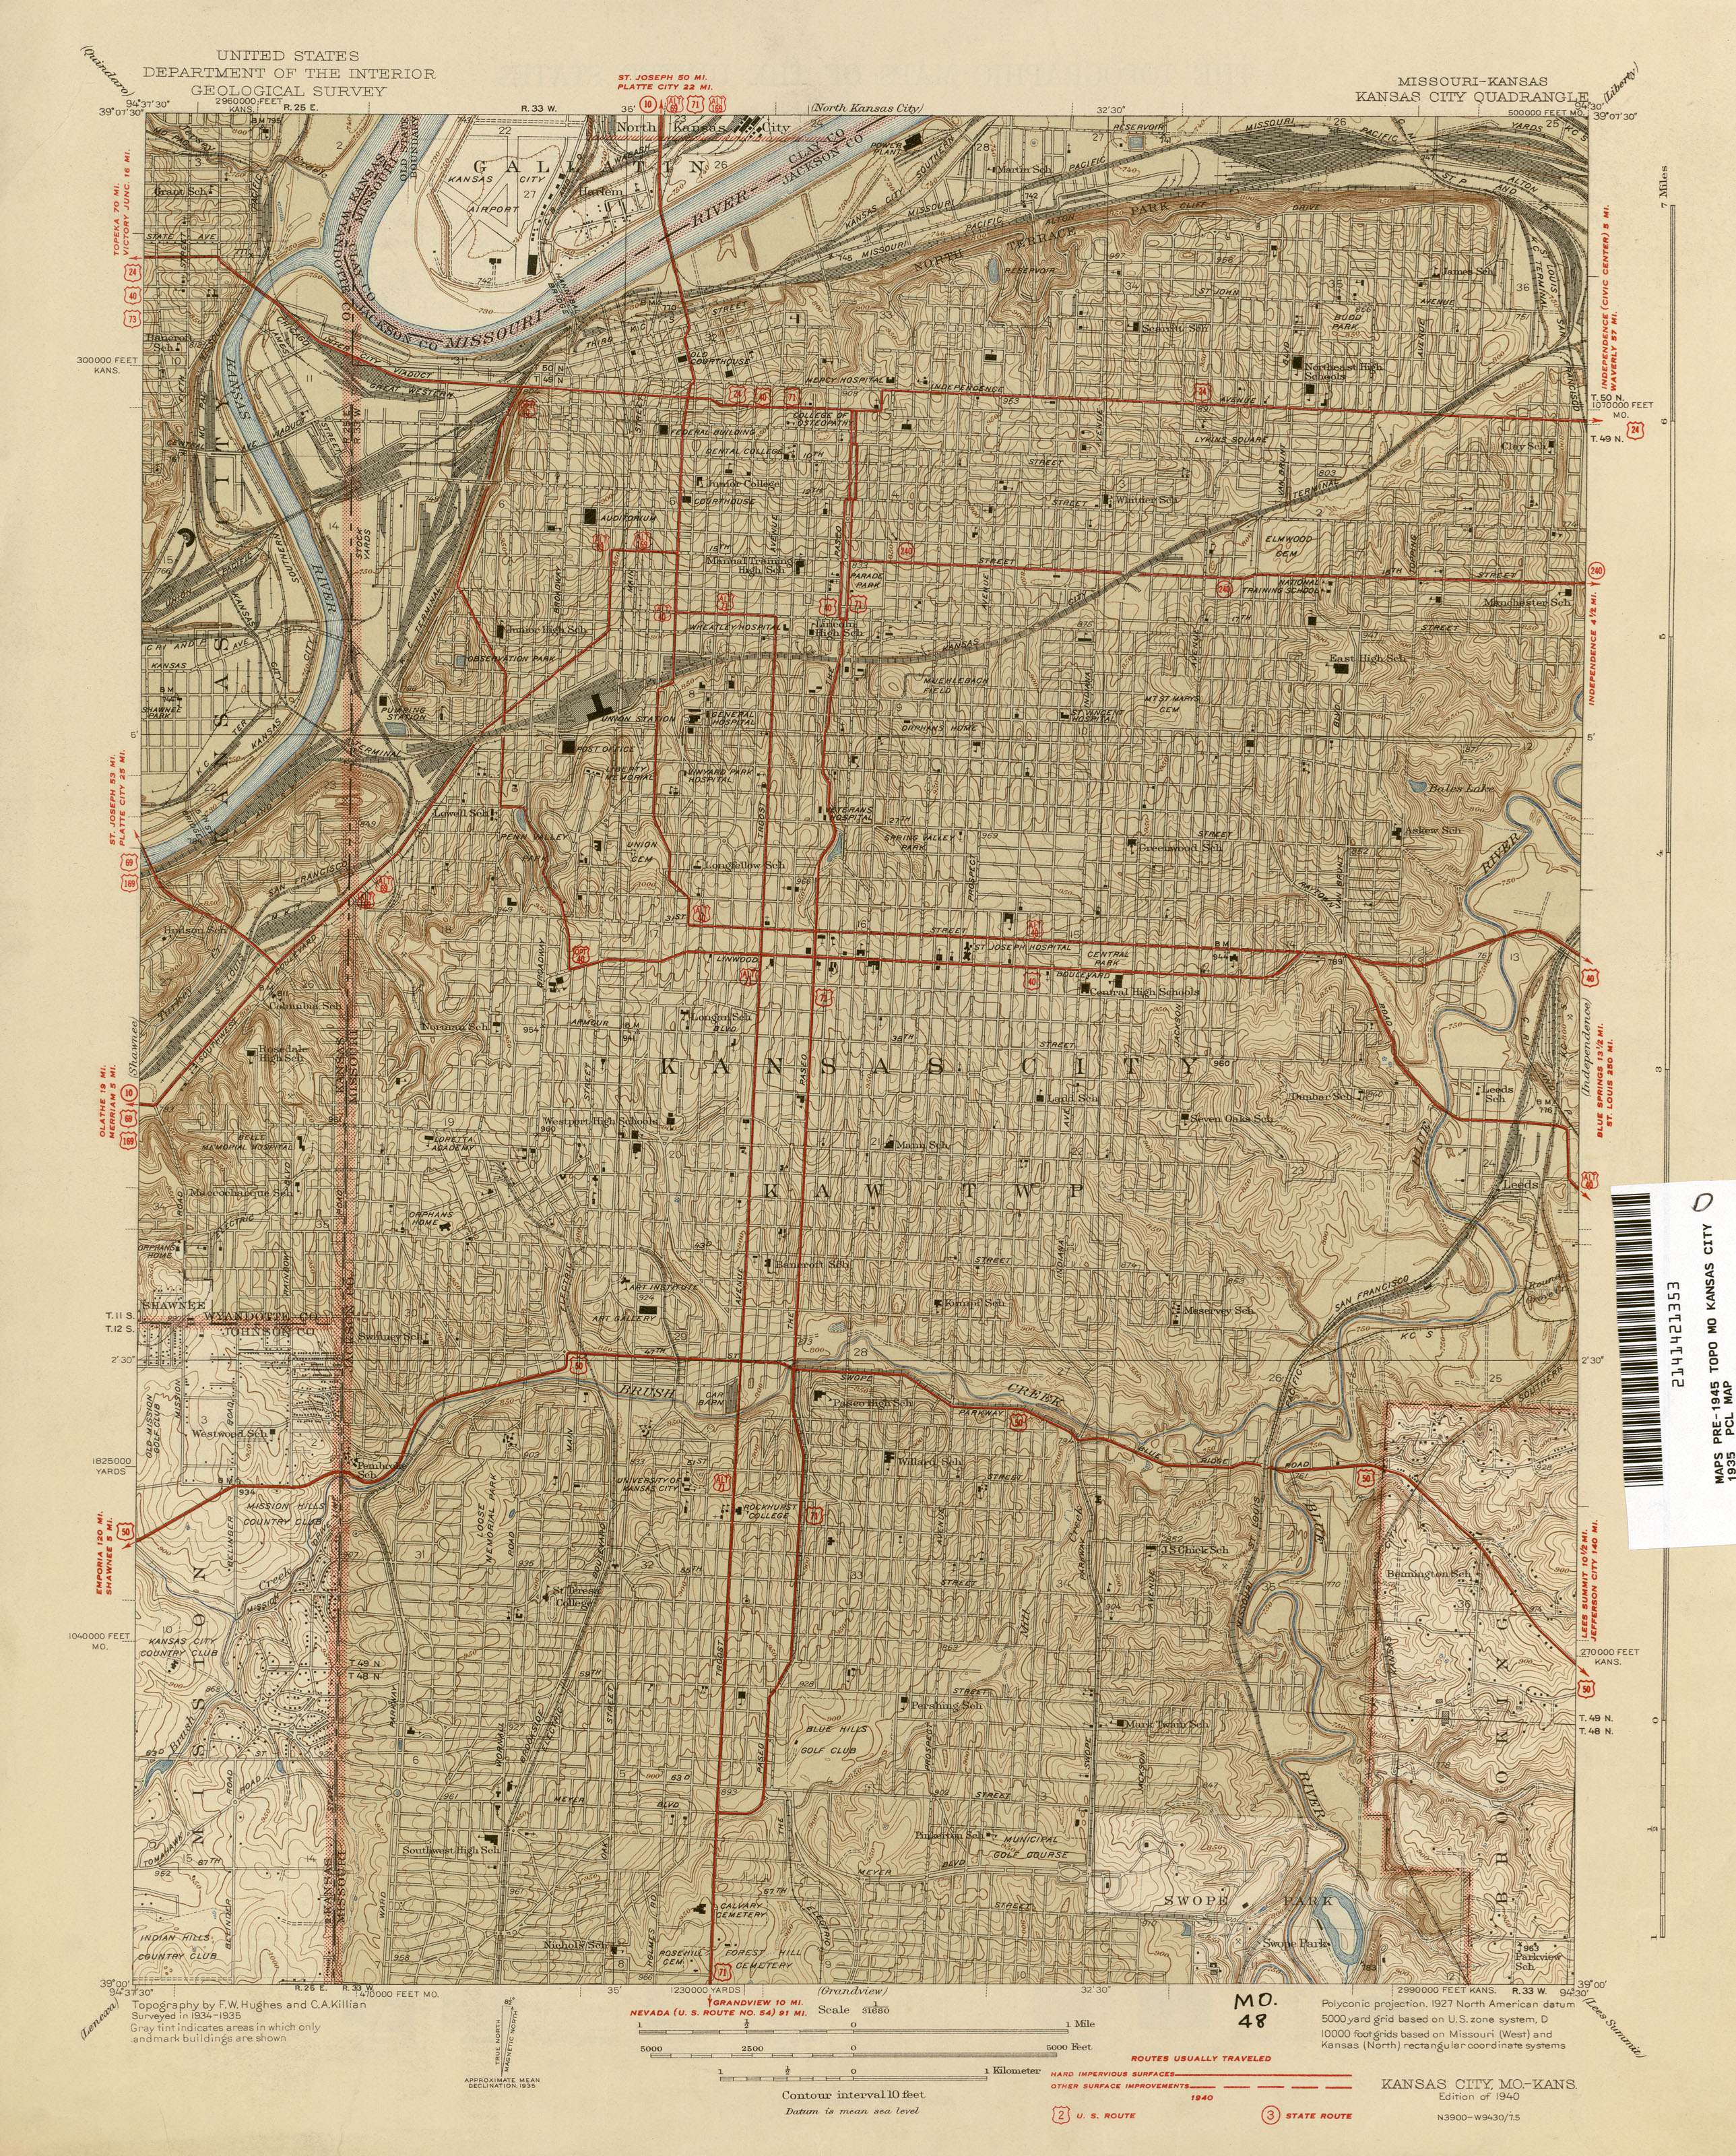 Kansas Historical Topographic Maps - Perry-Castañeda Map ... on salina ks map online, salina kansas, interactive map of salina ks streets,